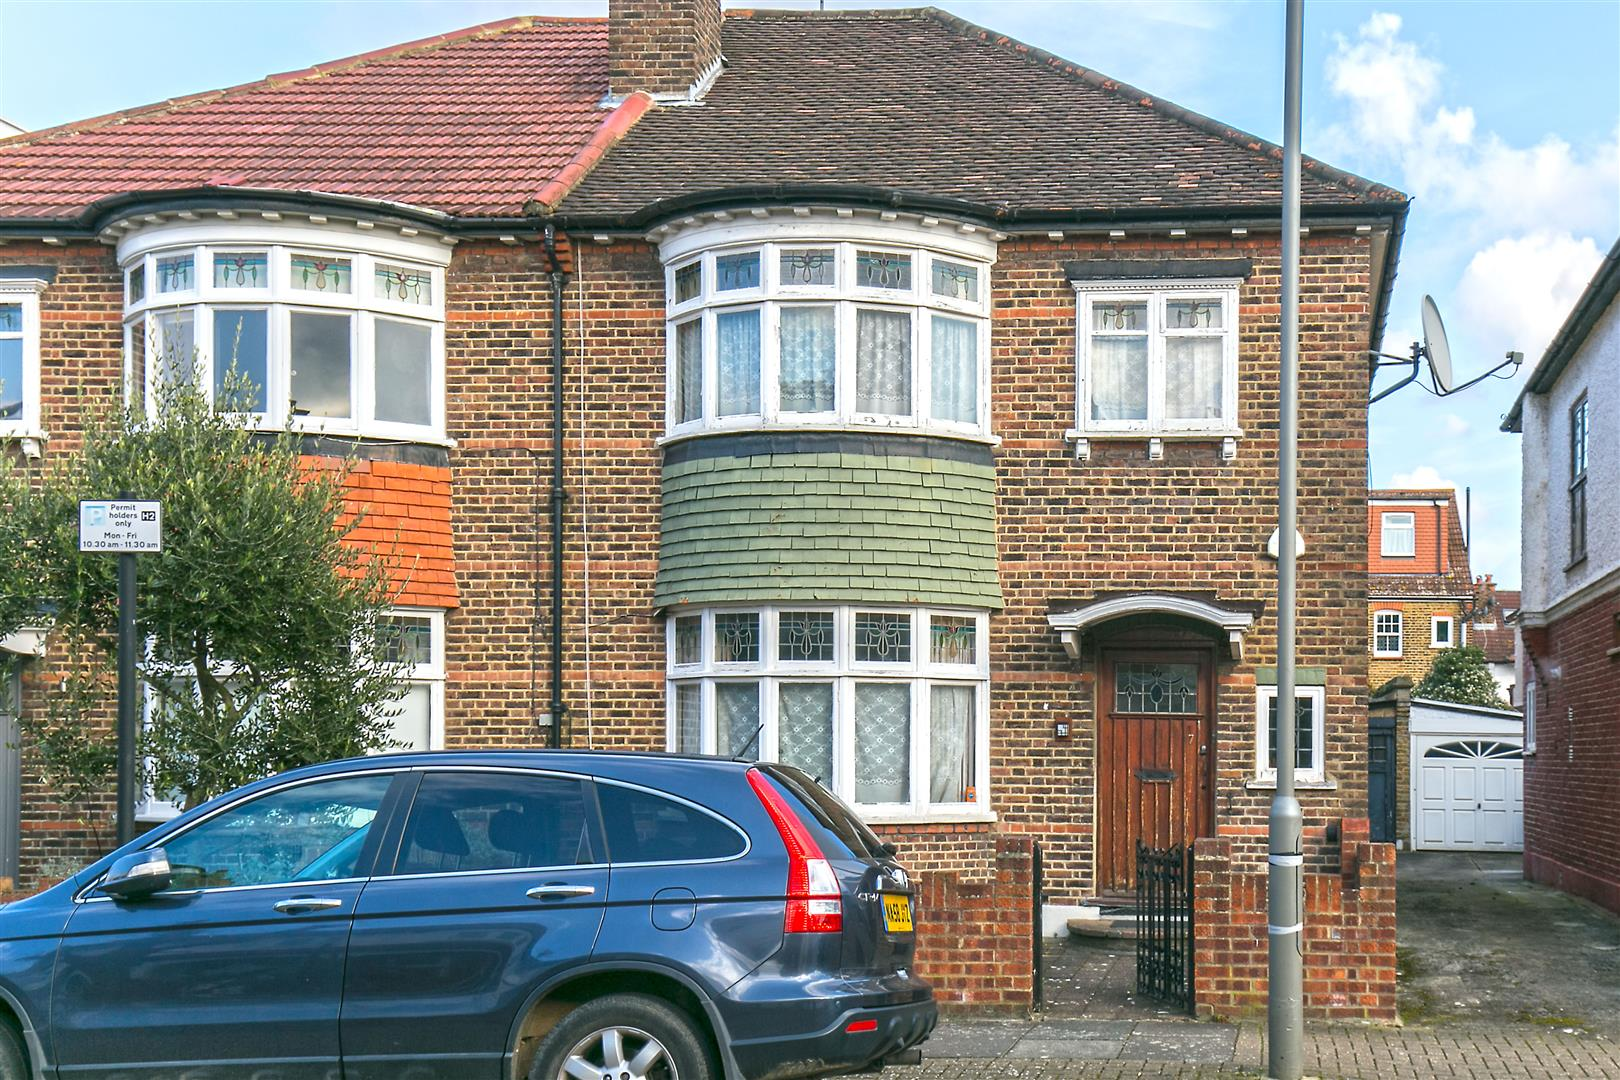 Holmside Road, Clapham South, SW12